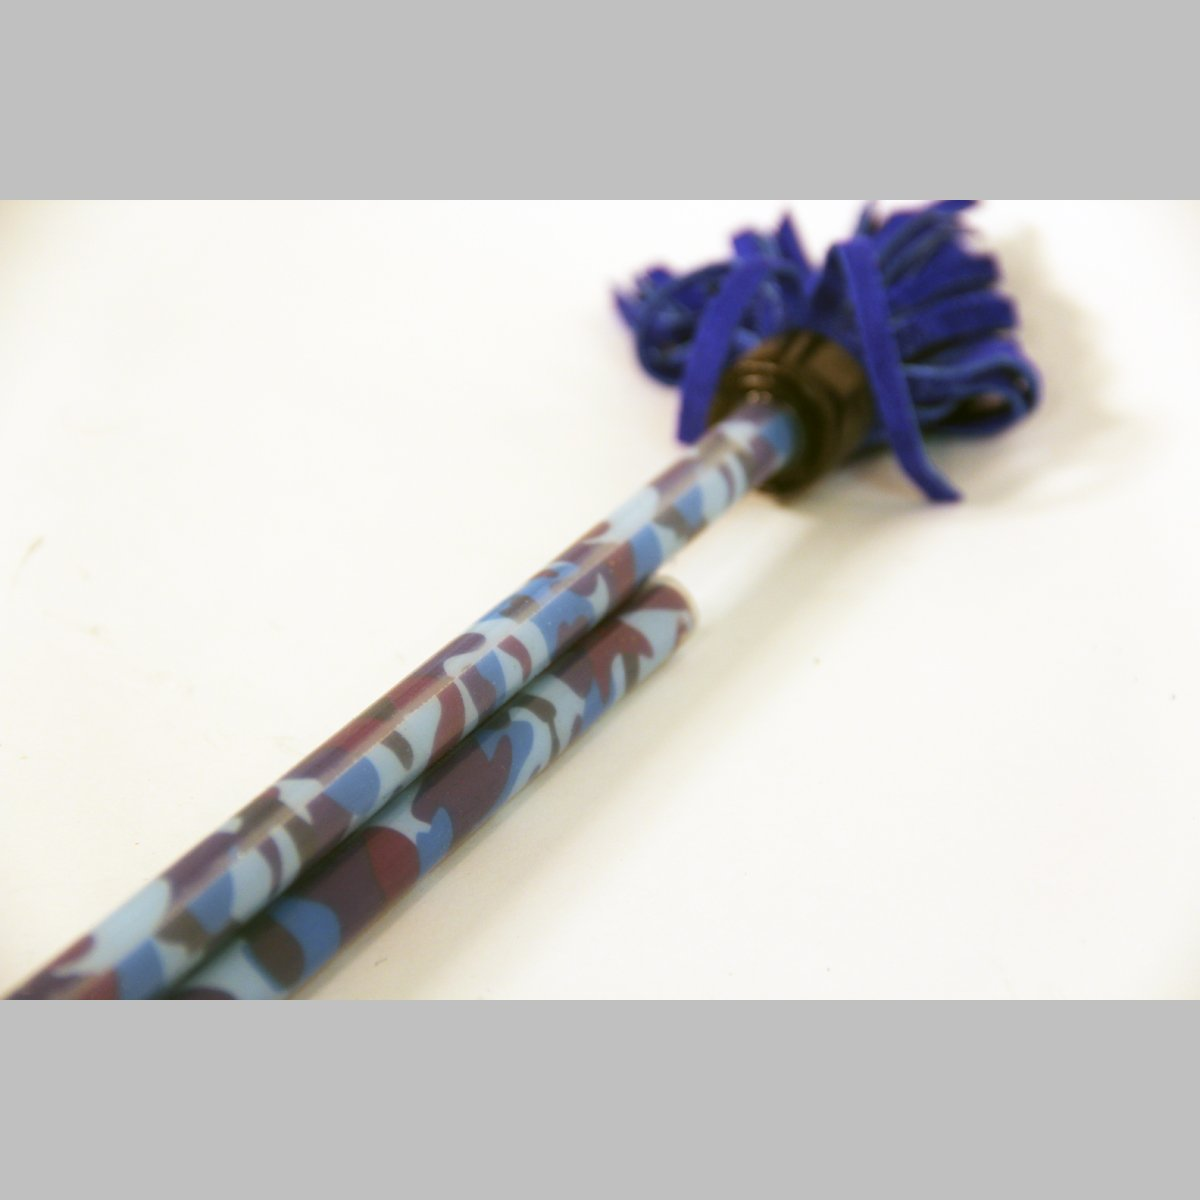 "Z-Stix Made to Order Handmade Juggling Sticks-Flower Sticks-Devil Sticks (King's Spear 30"",Blue Camo)"